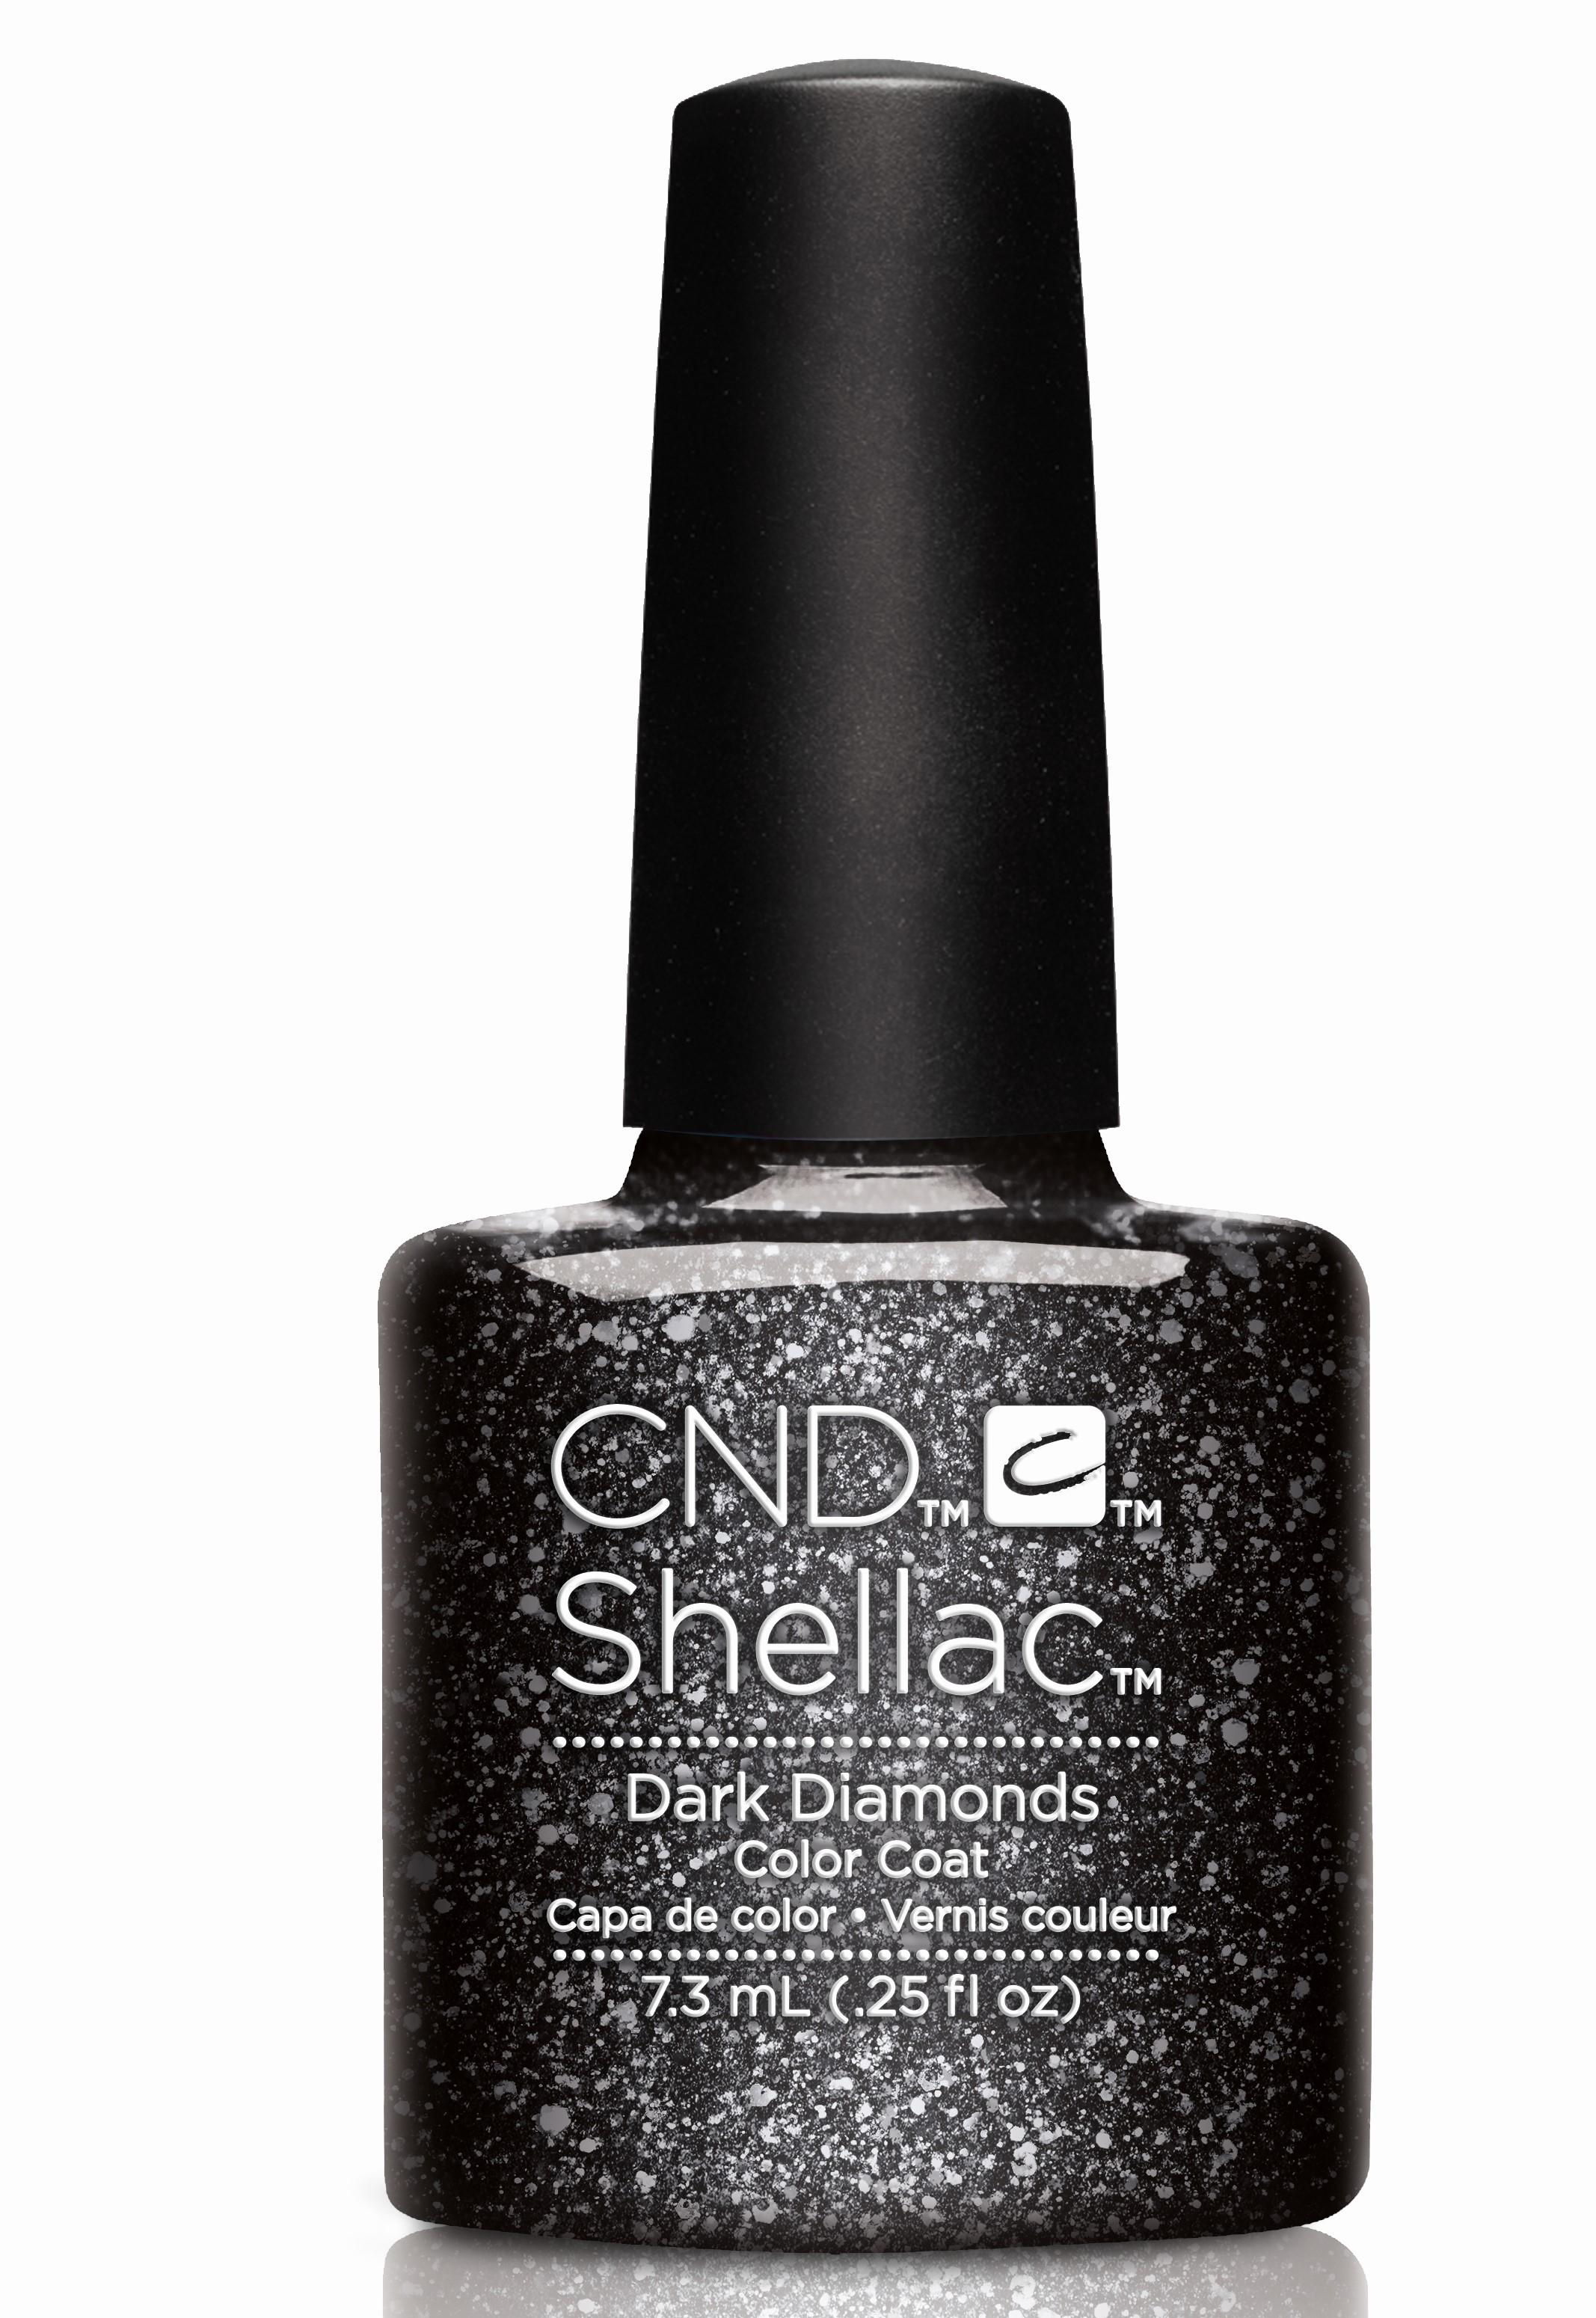 CND 91258 покрытие гелевое Dark Diamonds / SHELLAC Starsrtuck 7,3мл cnd 083 покрытие гелевое bare chemise shellac 7 3мл